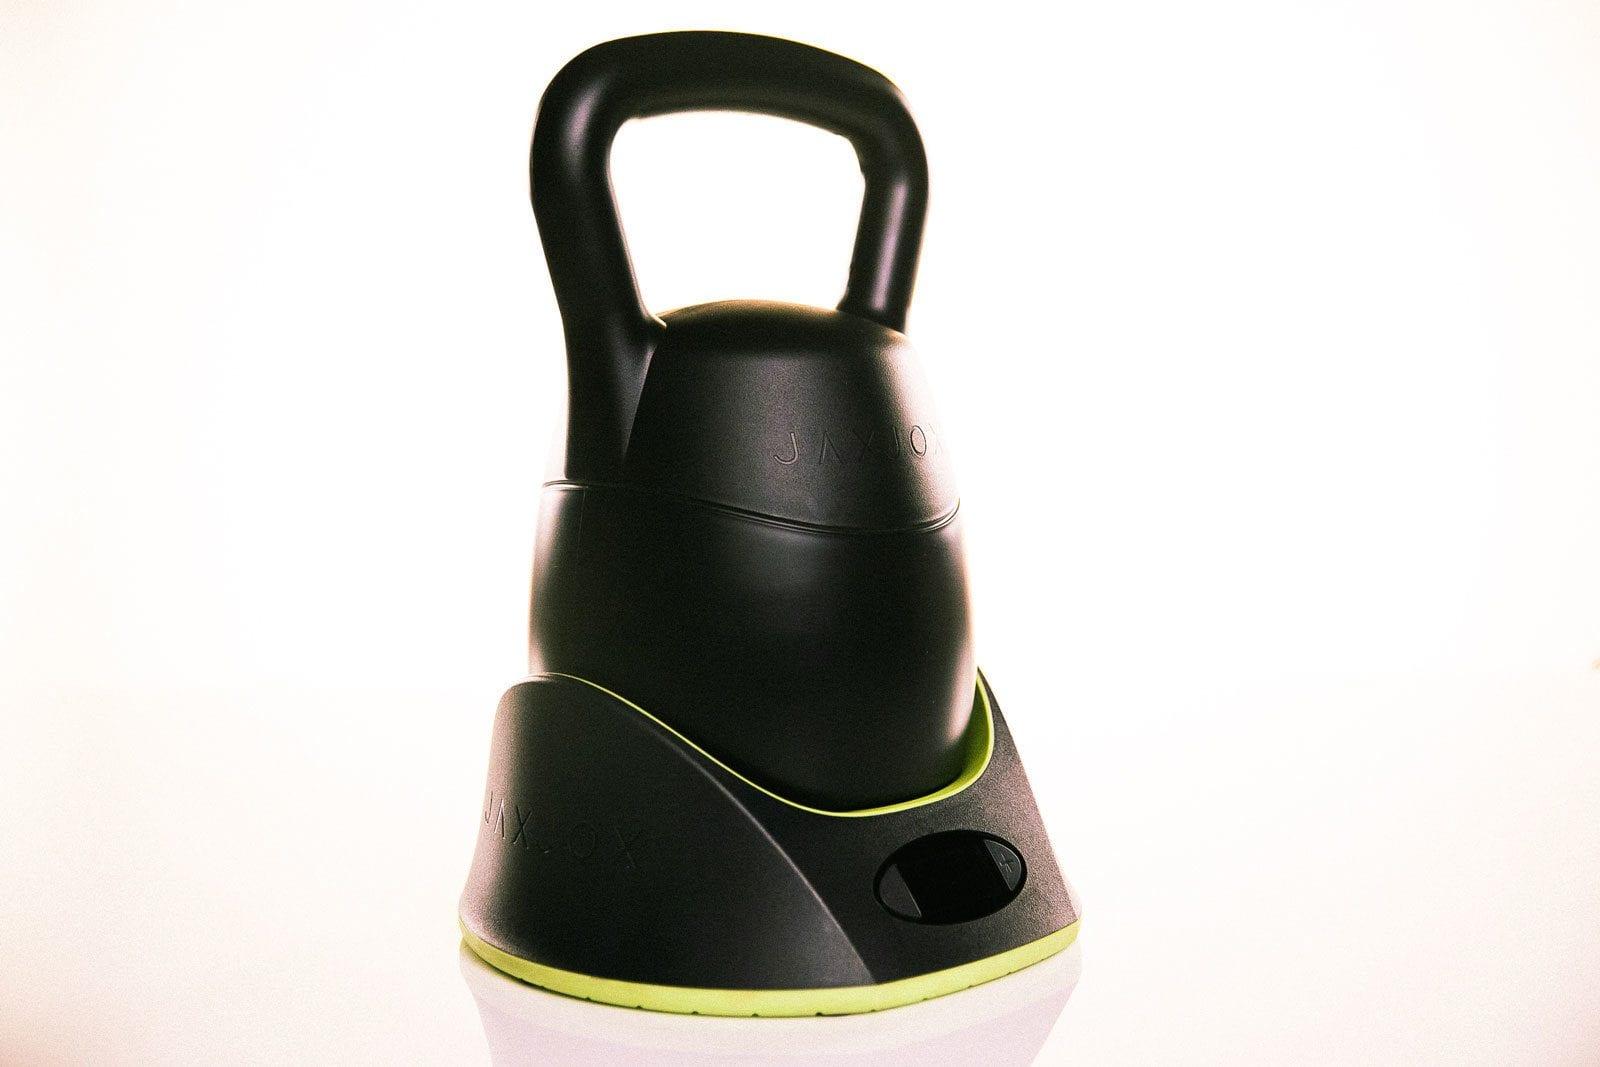 JAXJOX- smart kettlebell